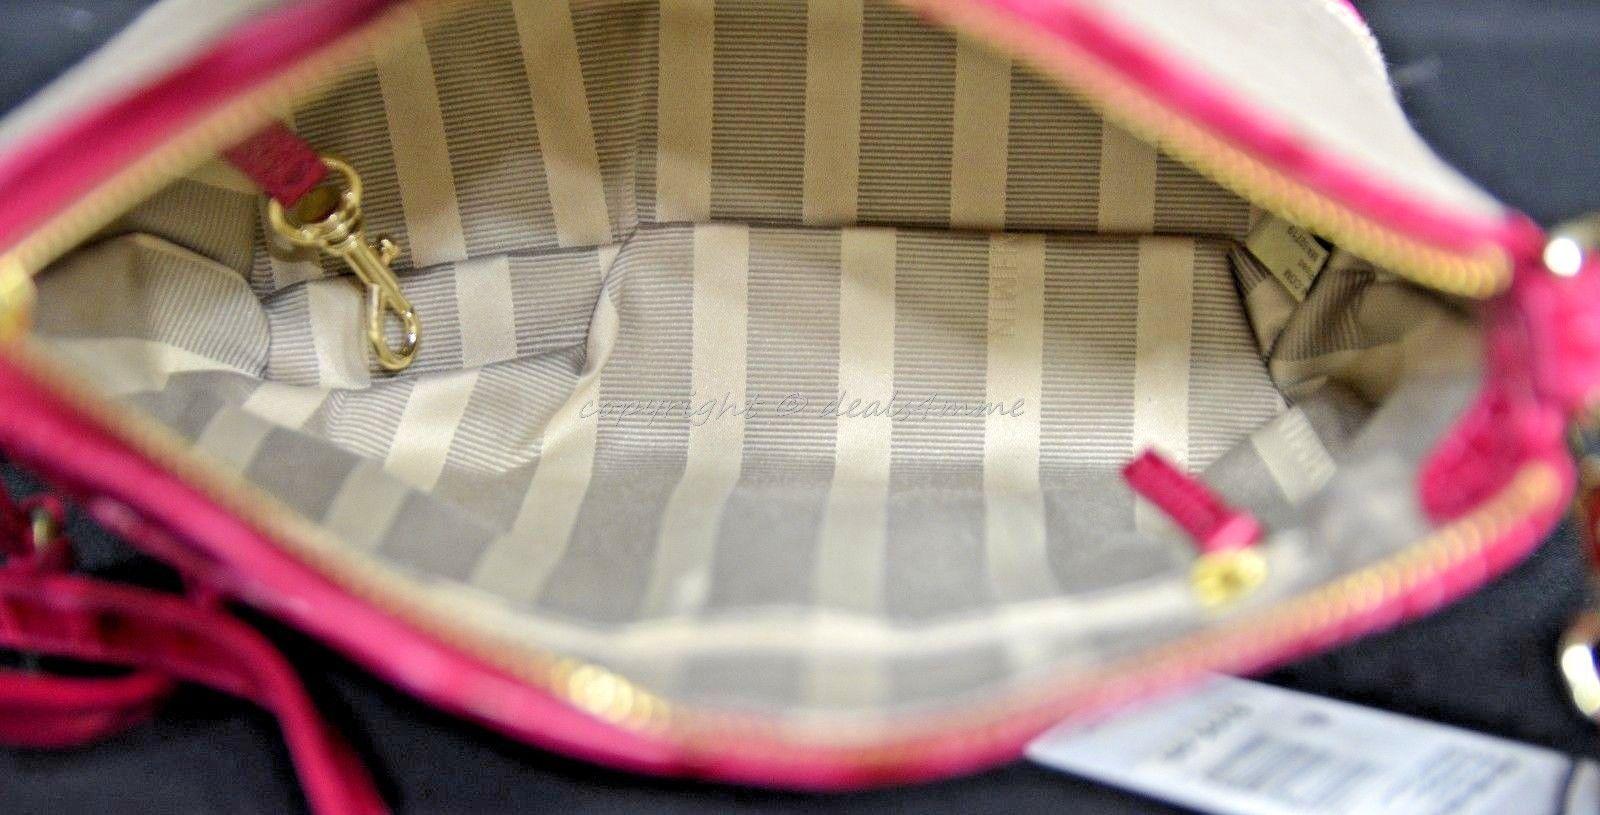 NWT Brahmin Mini Duxbury Shoulder Bag in Punch Harbor, Pink Leather/Beige Fabric image 3